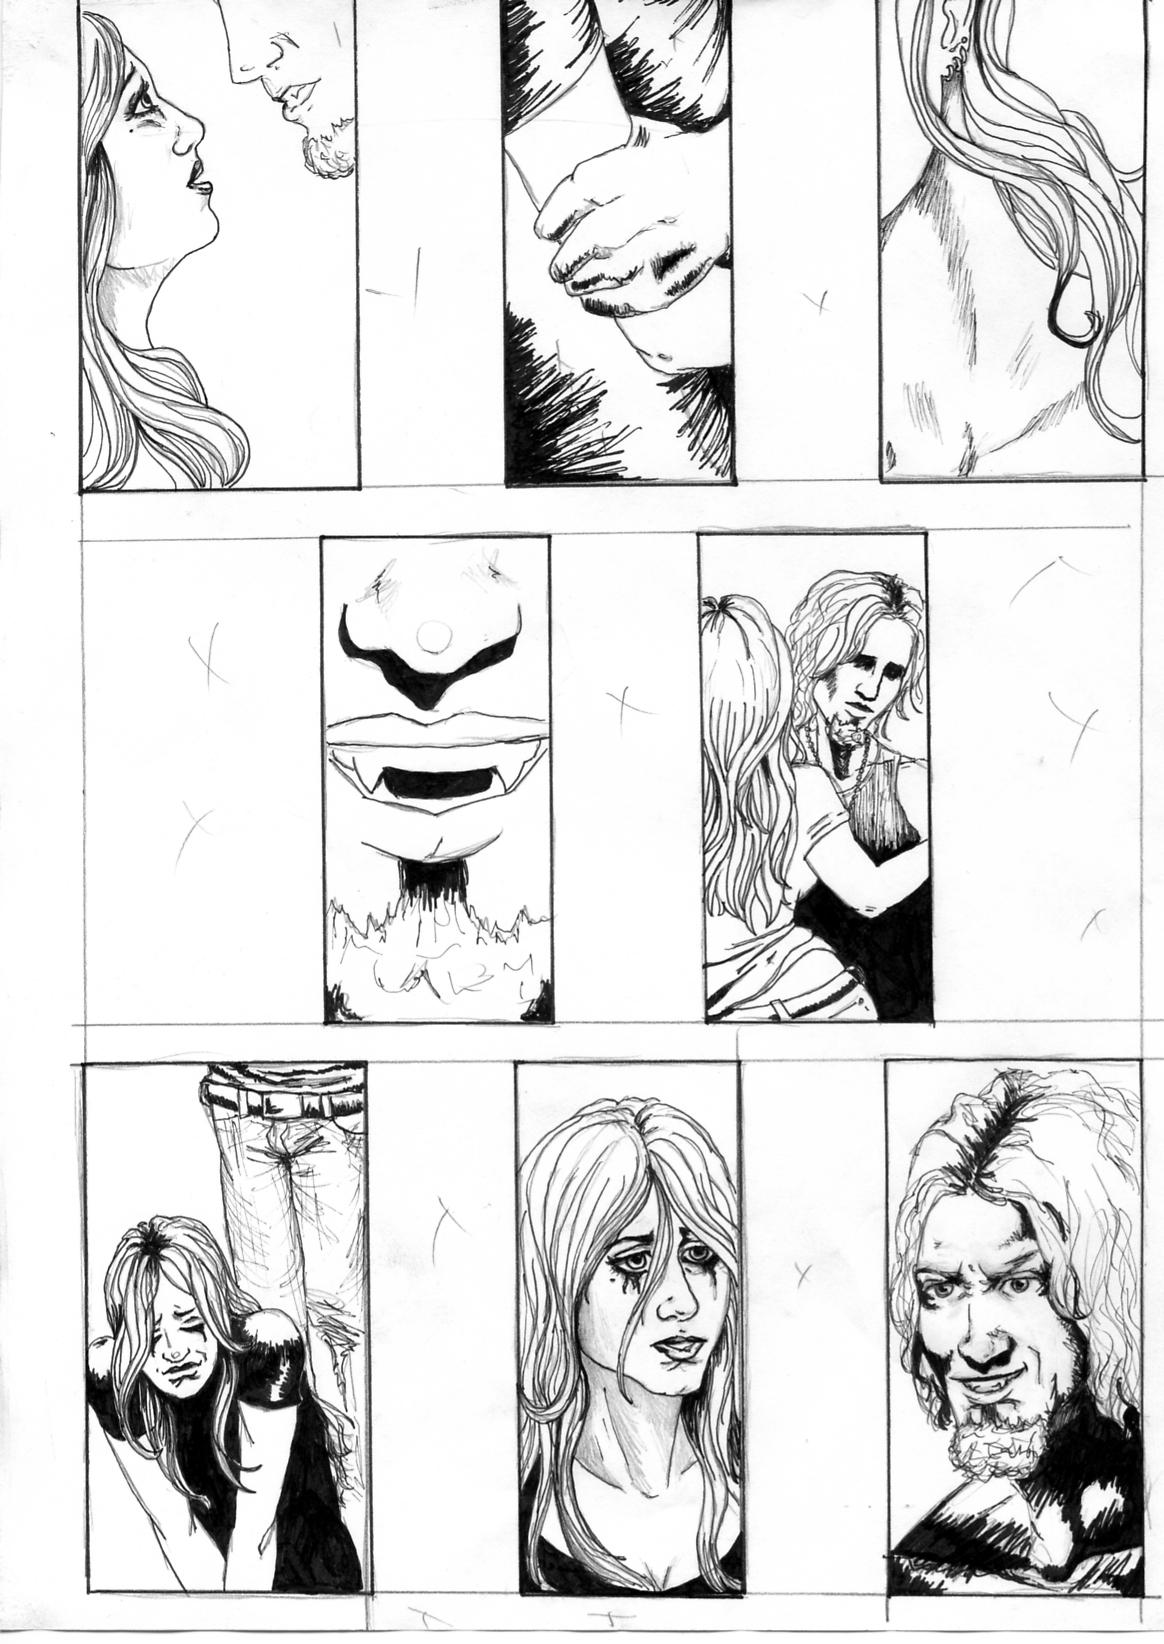 comic page, ink, vampire, man, woman, comic panels, comic layout